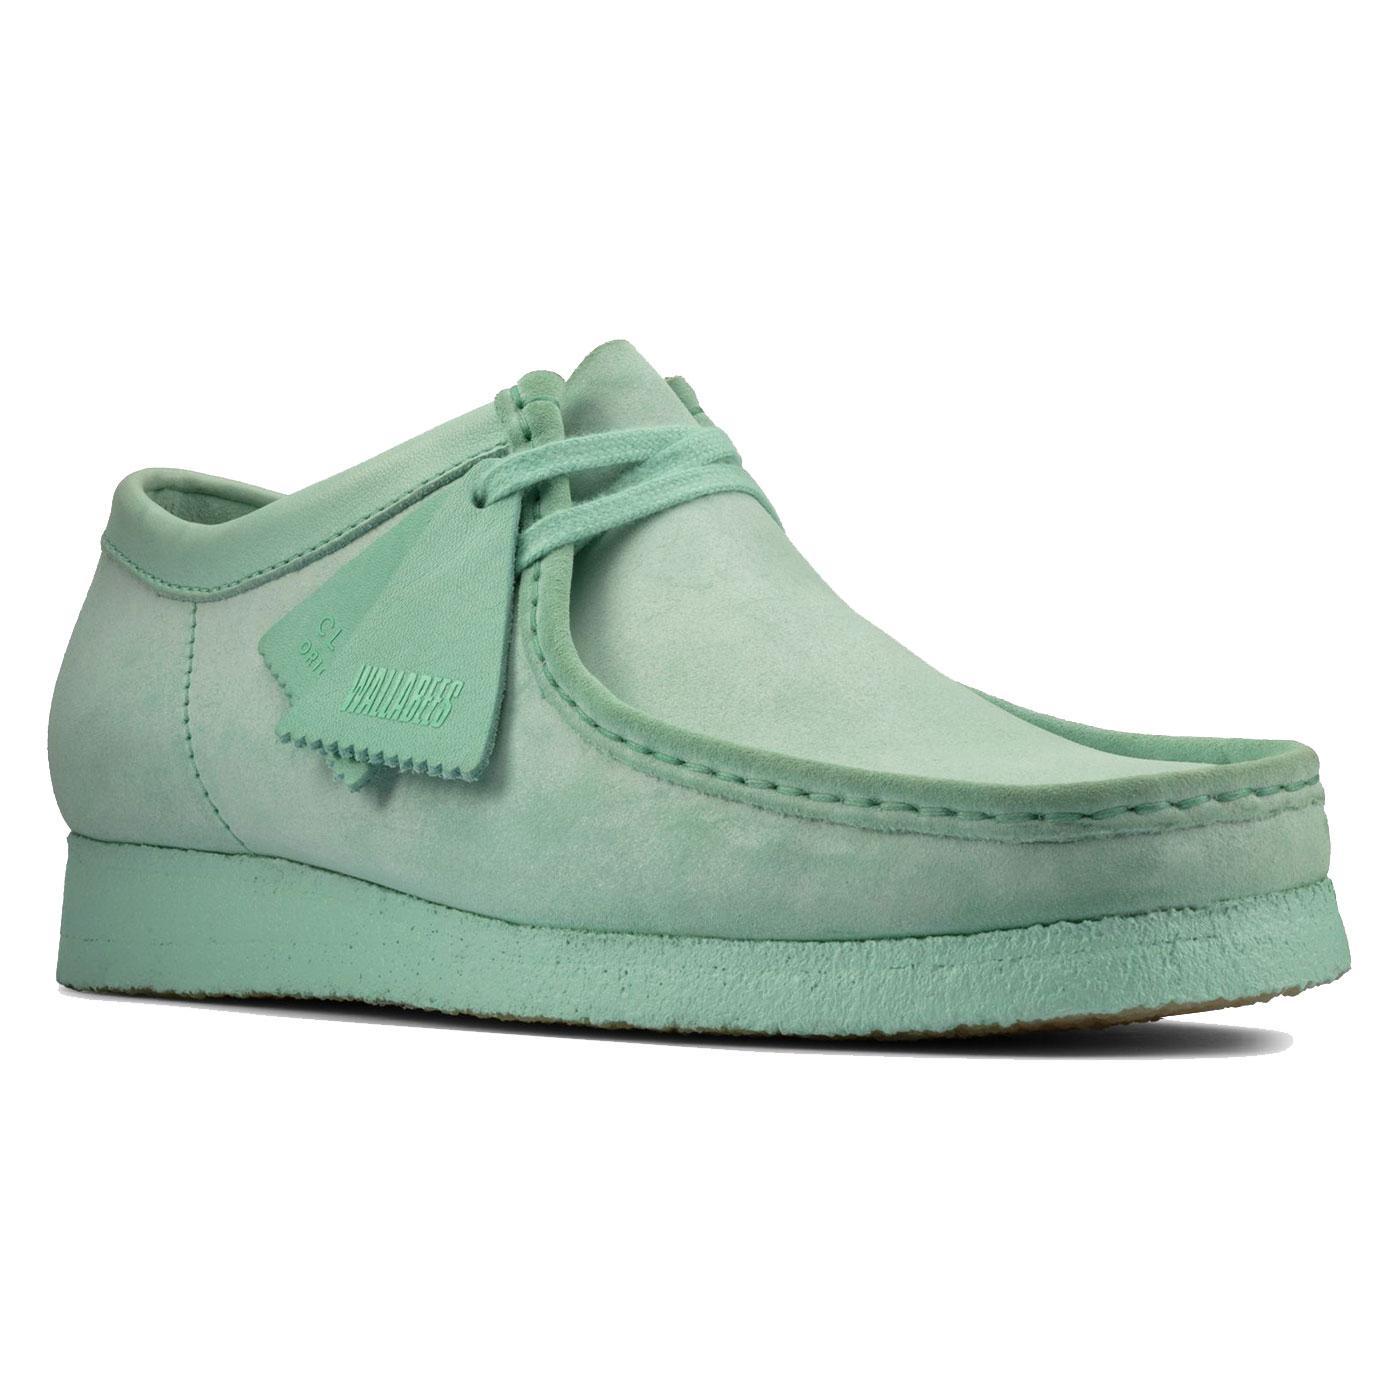 Wallabee Suede CLARKS ORIGINALS Womens Shoes MINT